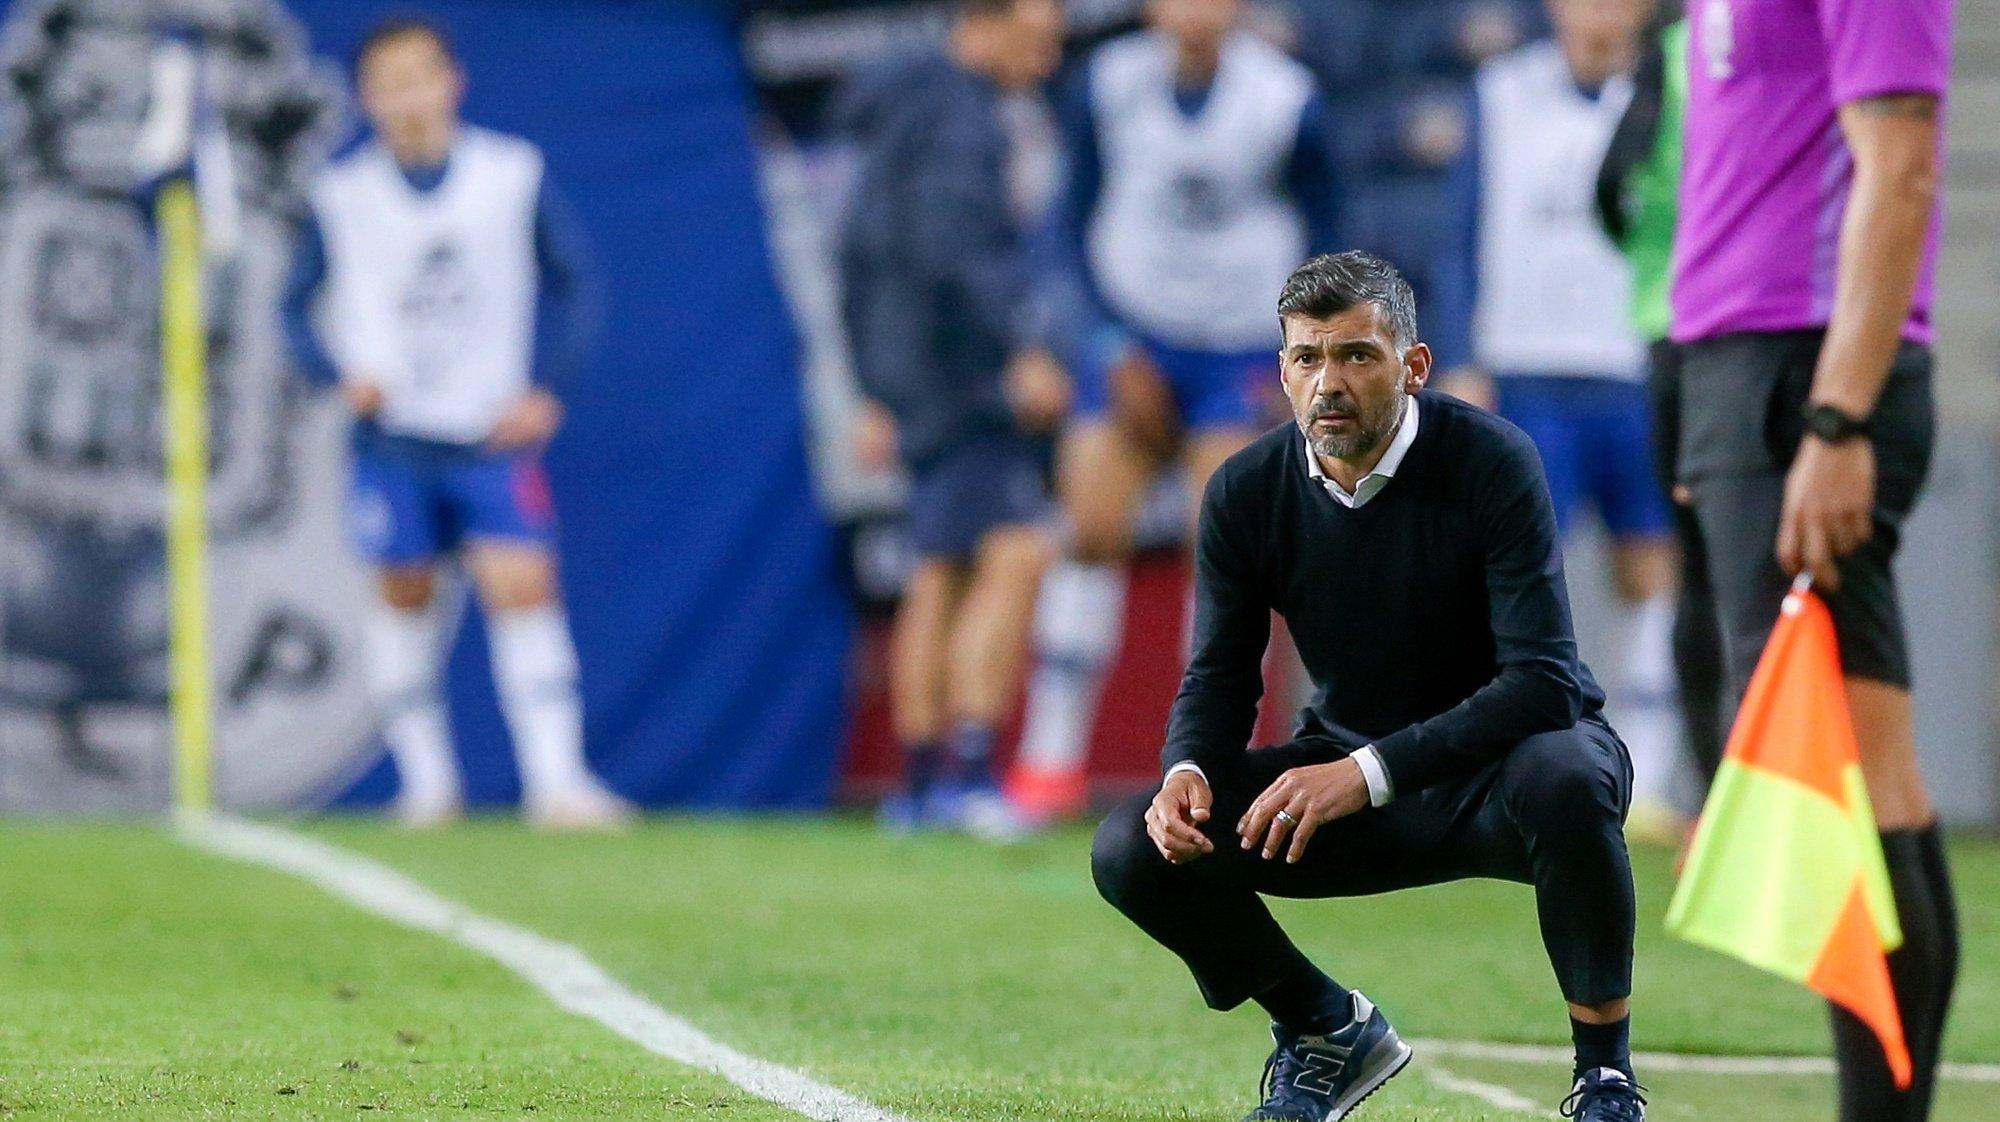 FC Porto's head coach Sergio Conceicao reacts during their Portuguese First League soccer match against Vitoria de Guimaraes, held at Dragao stadium, in Porto, north of Portugal, 22 April 2021. JOSE COELHO/LUSA